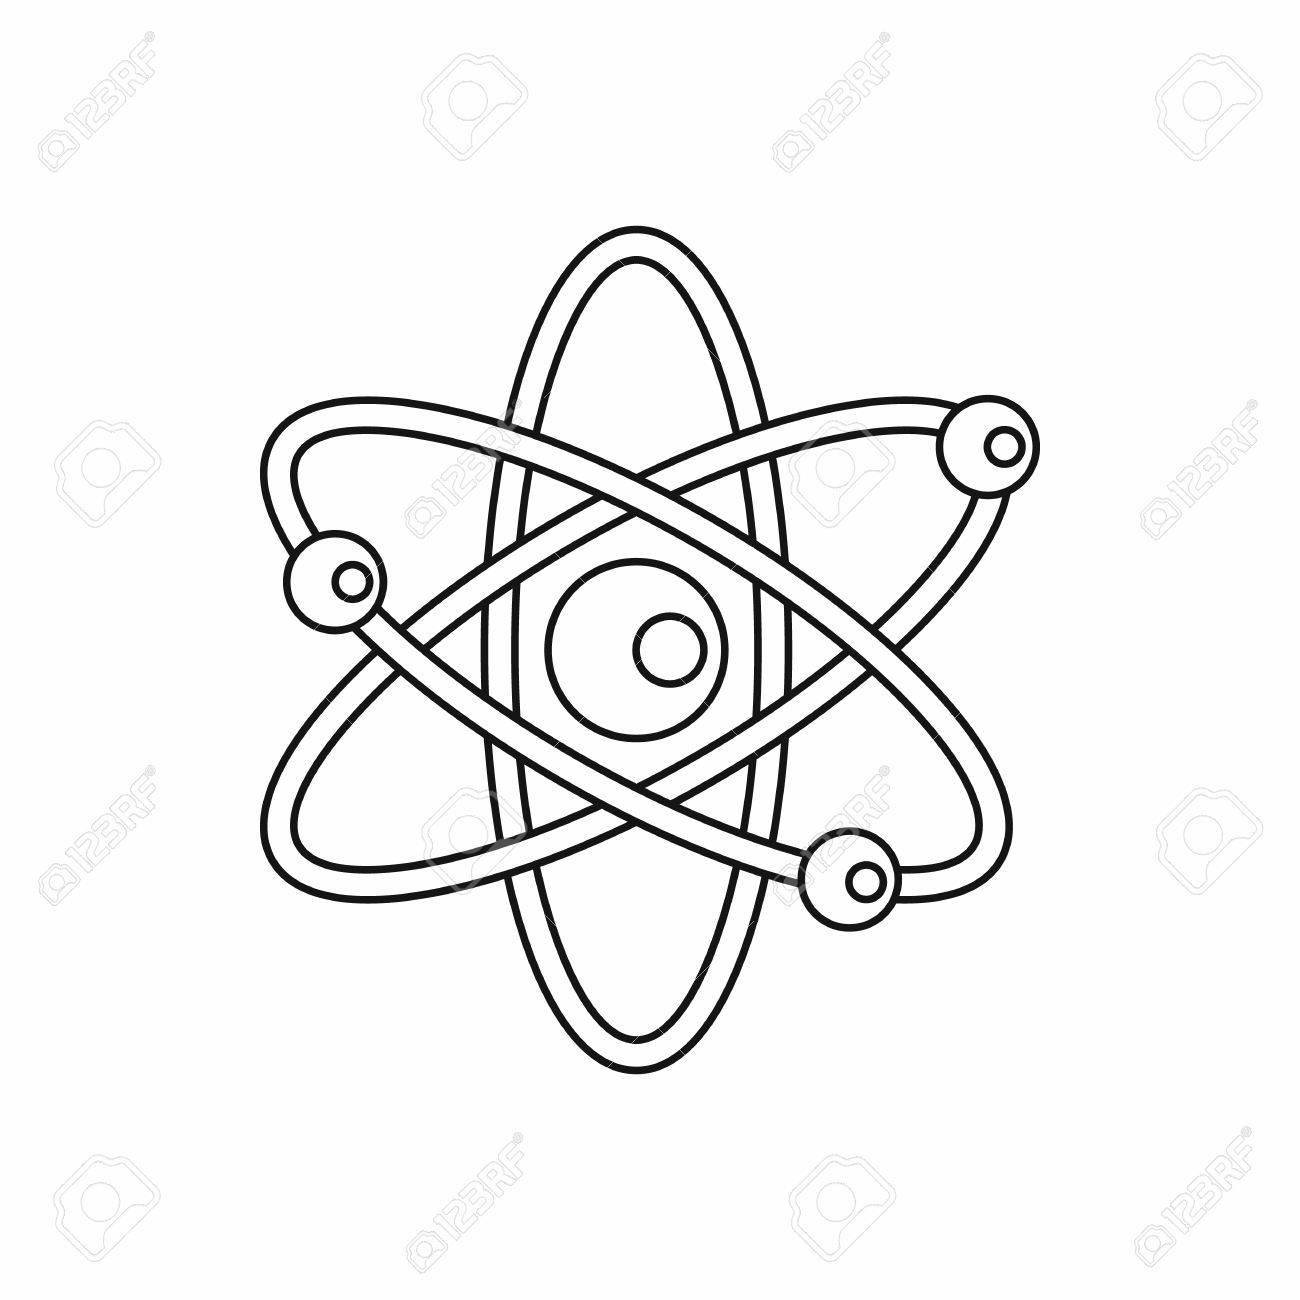 Atoms Drawing At Getdrawings